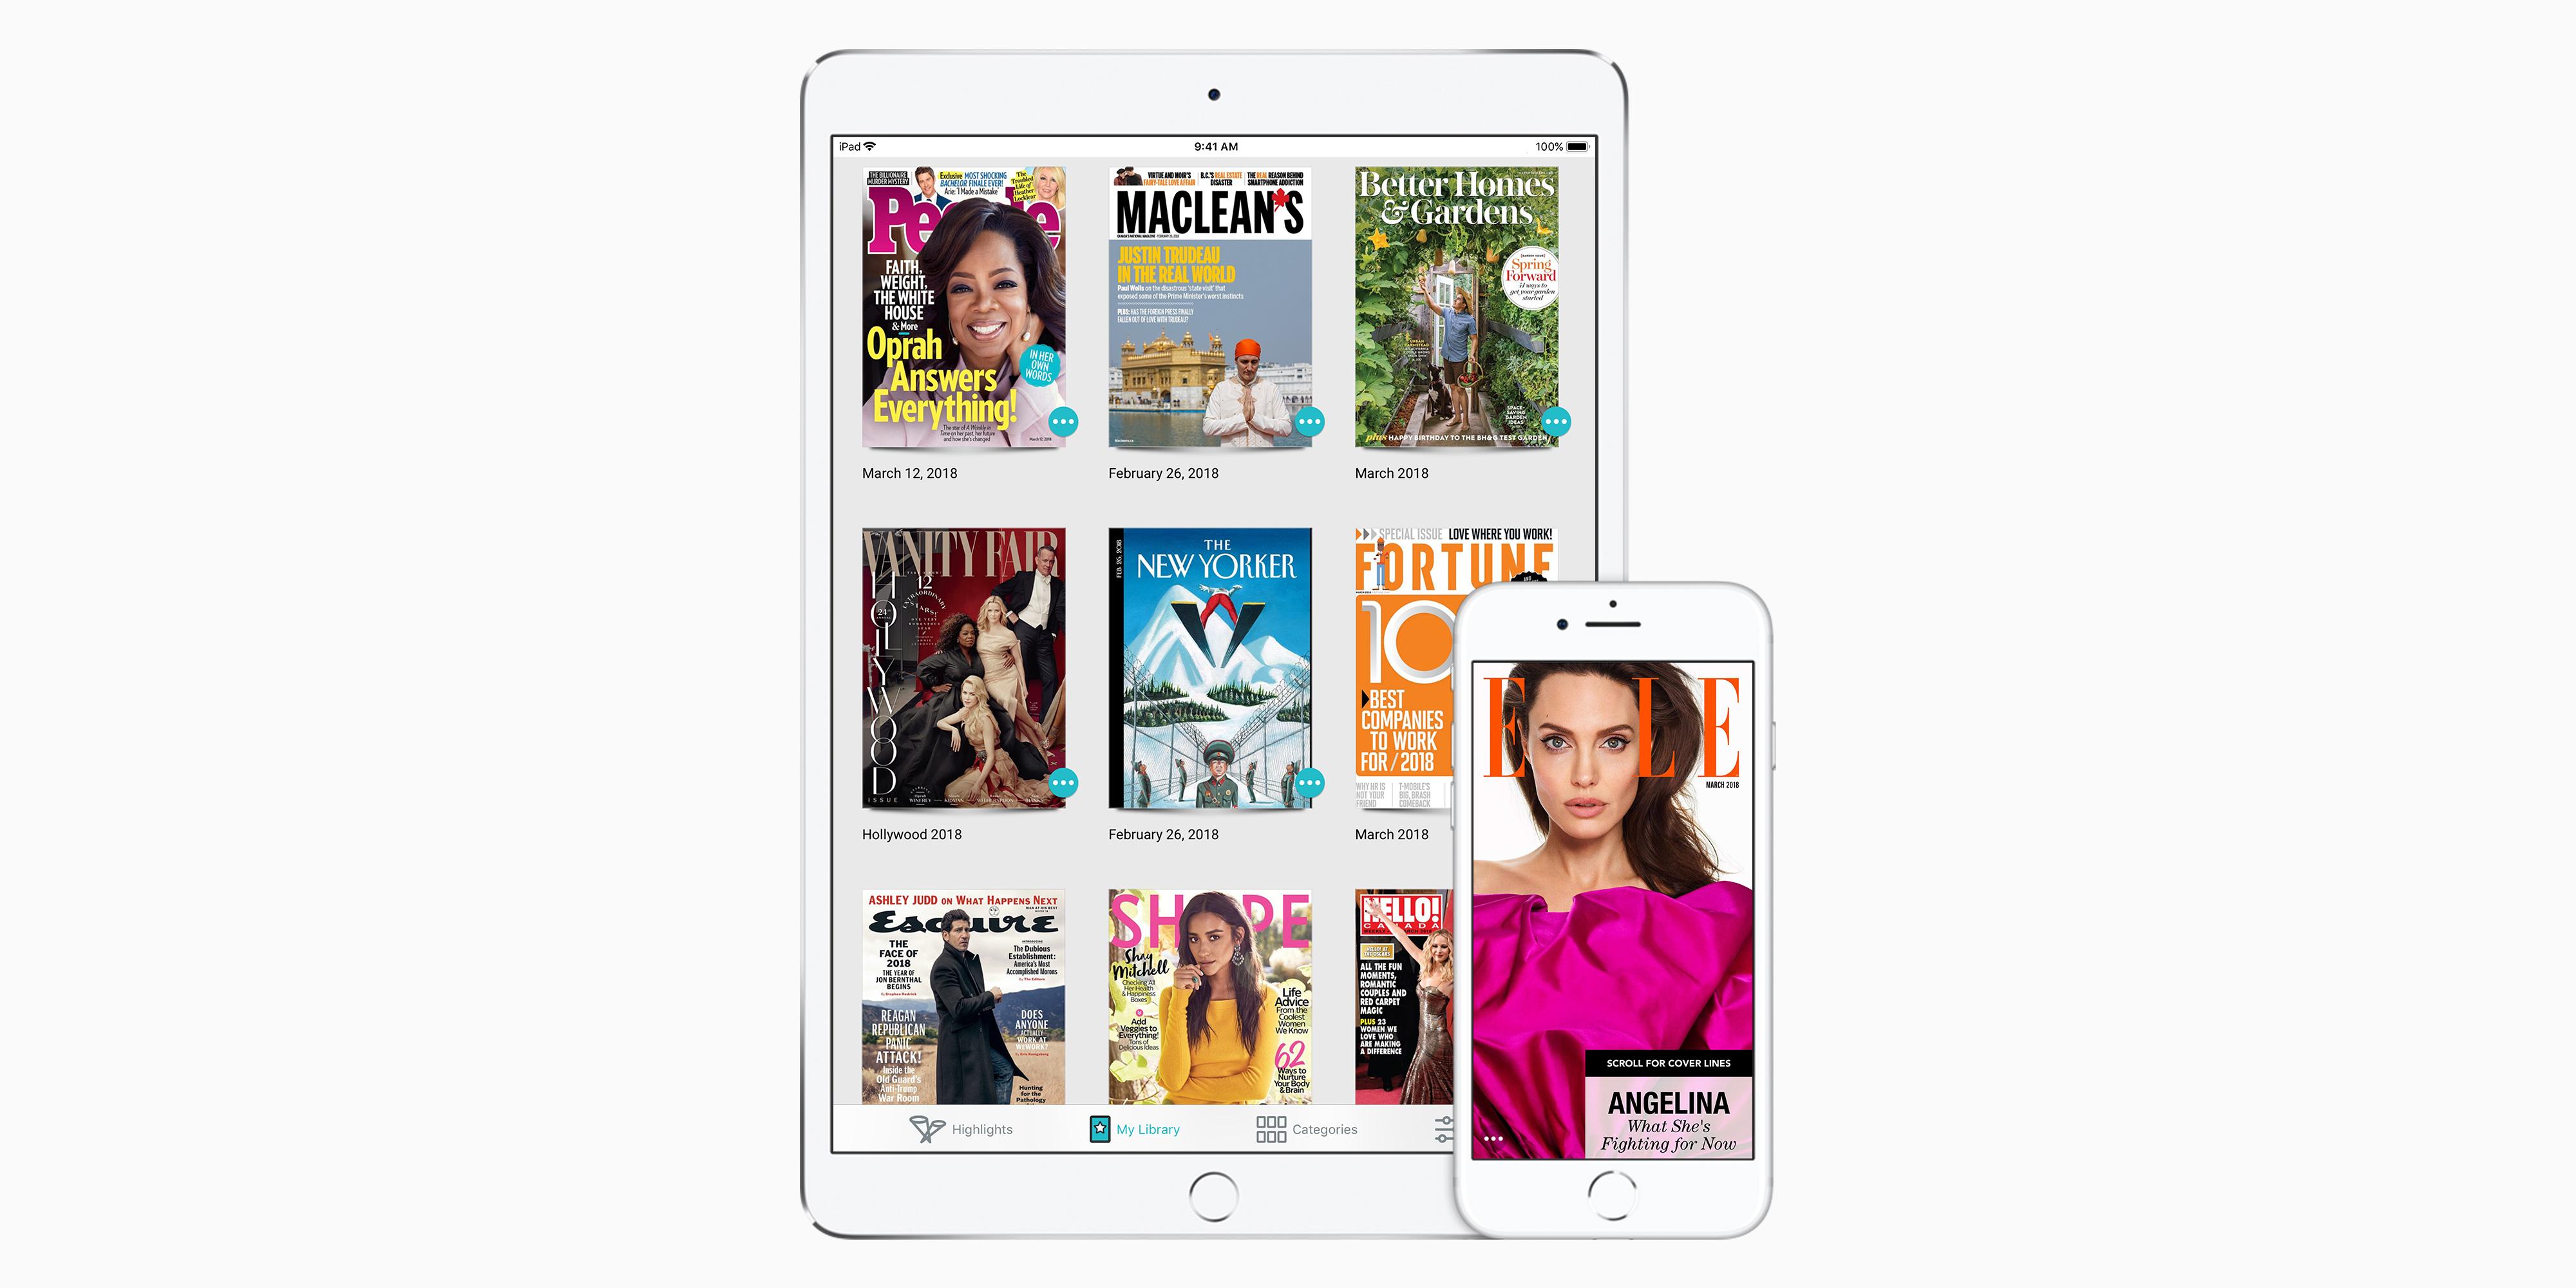 Magazines on iPad and iPhone